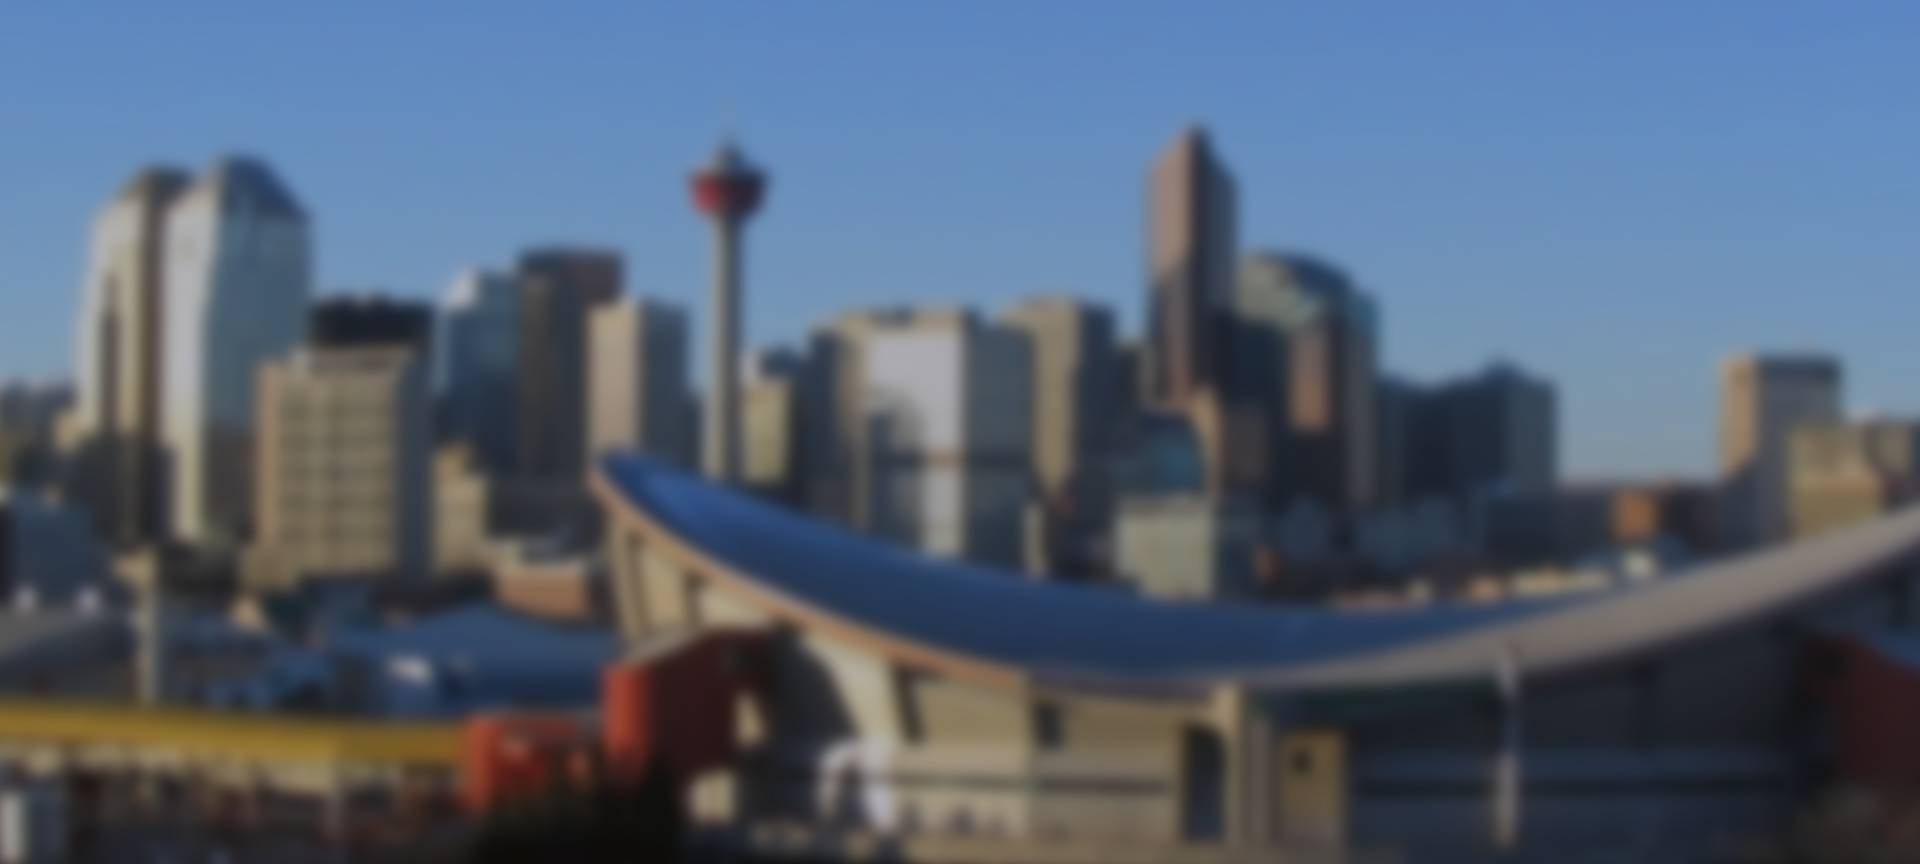 Calgary Law